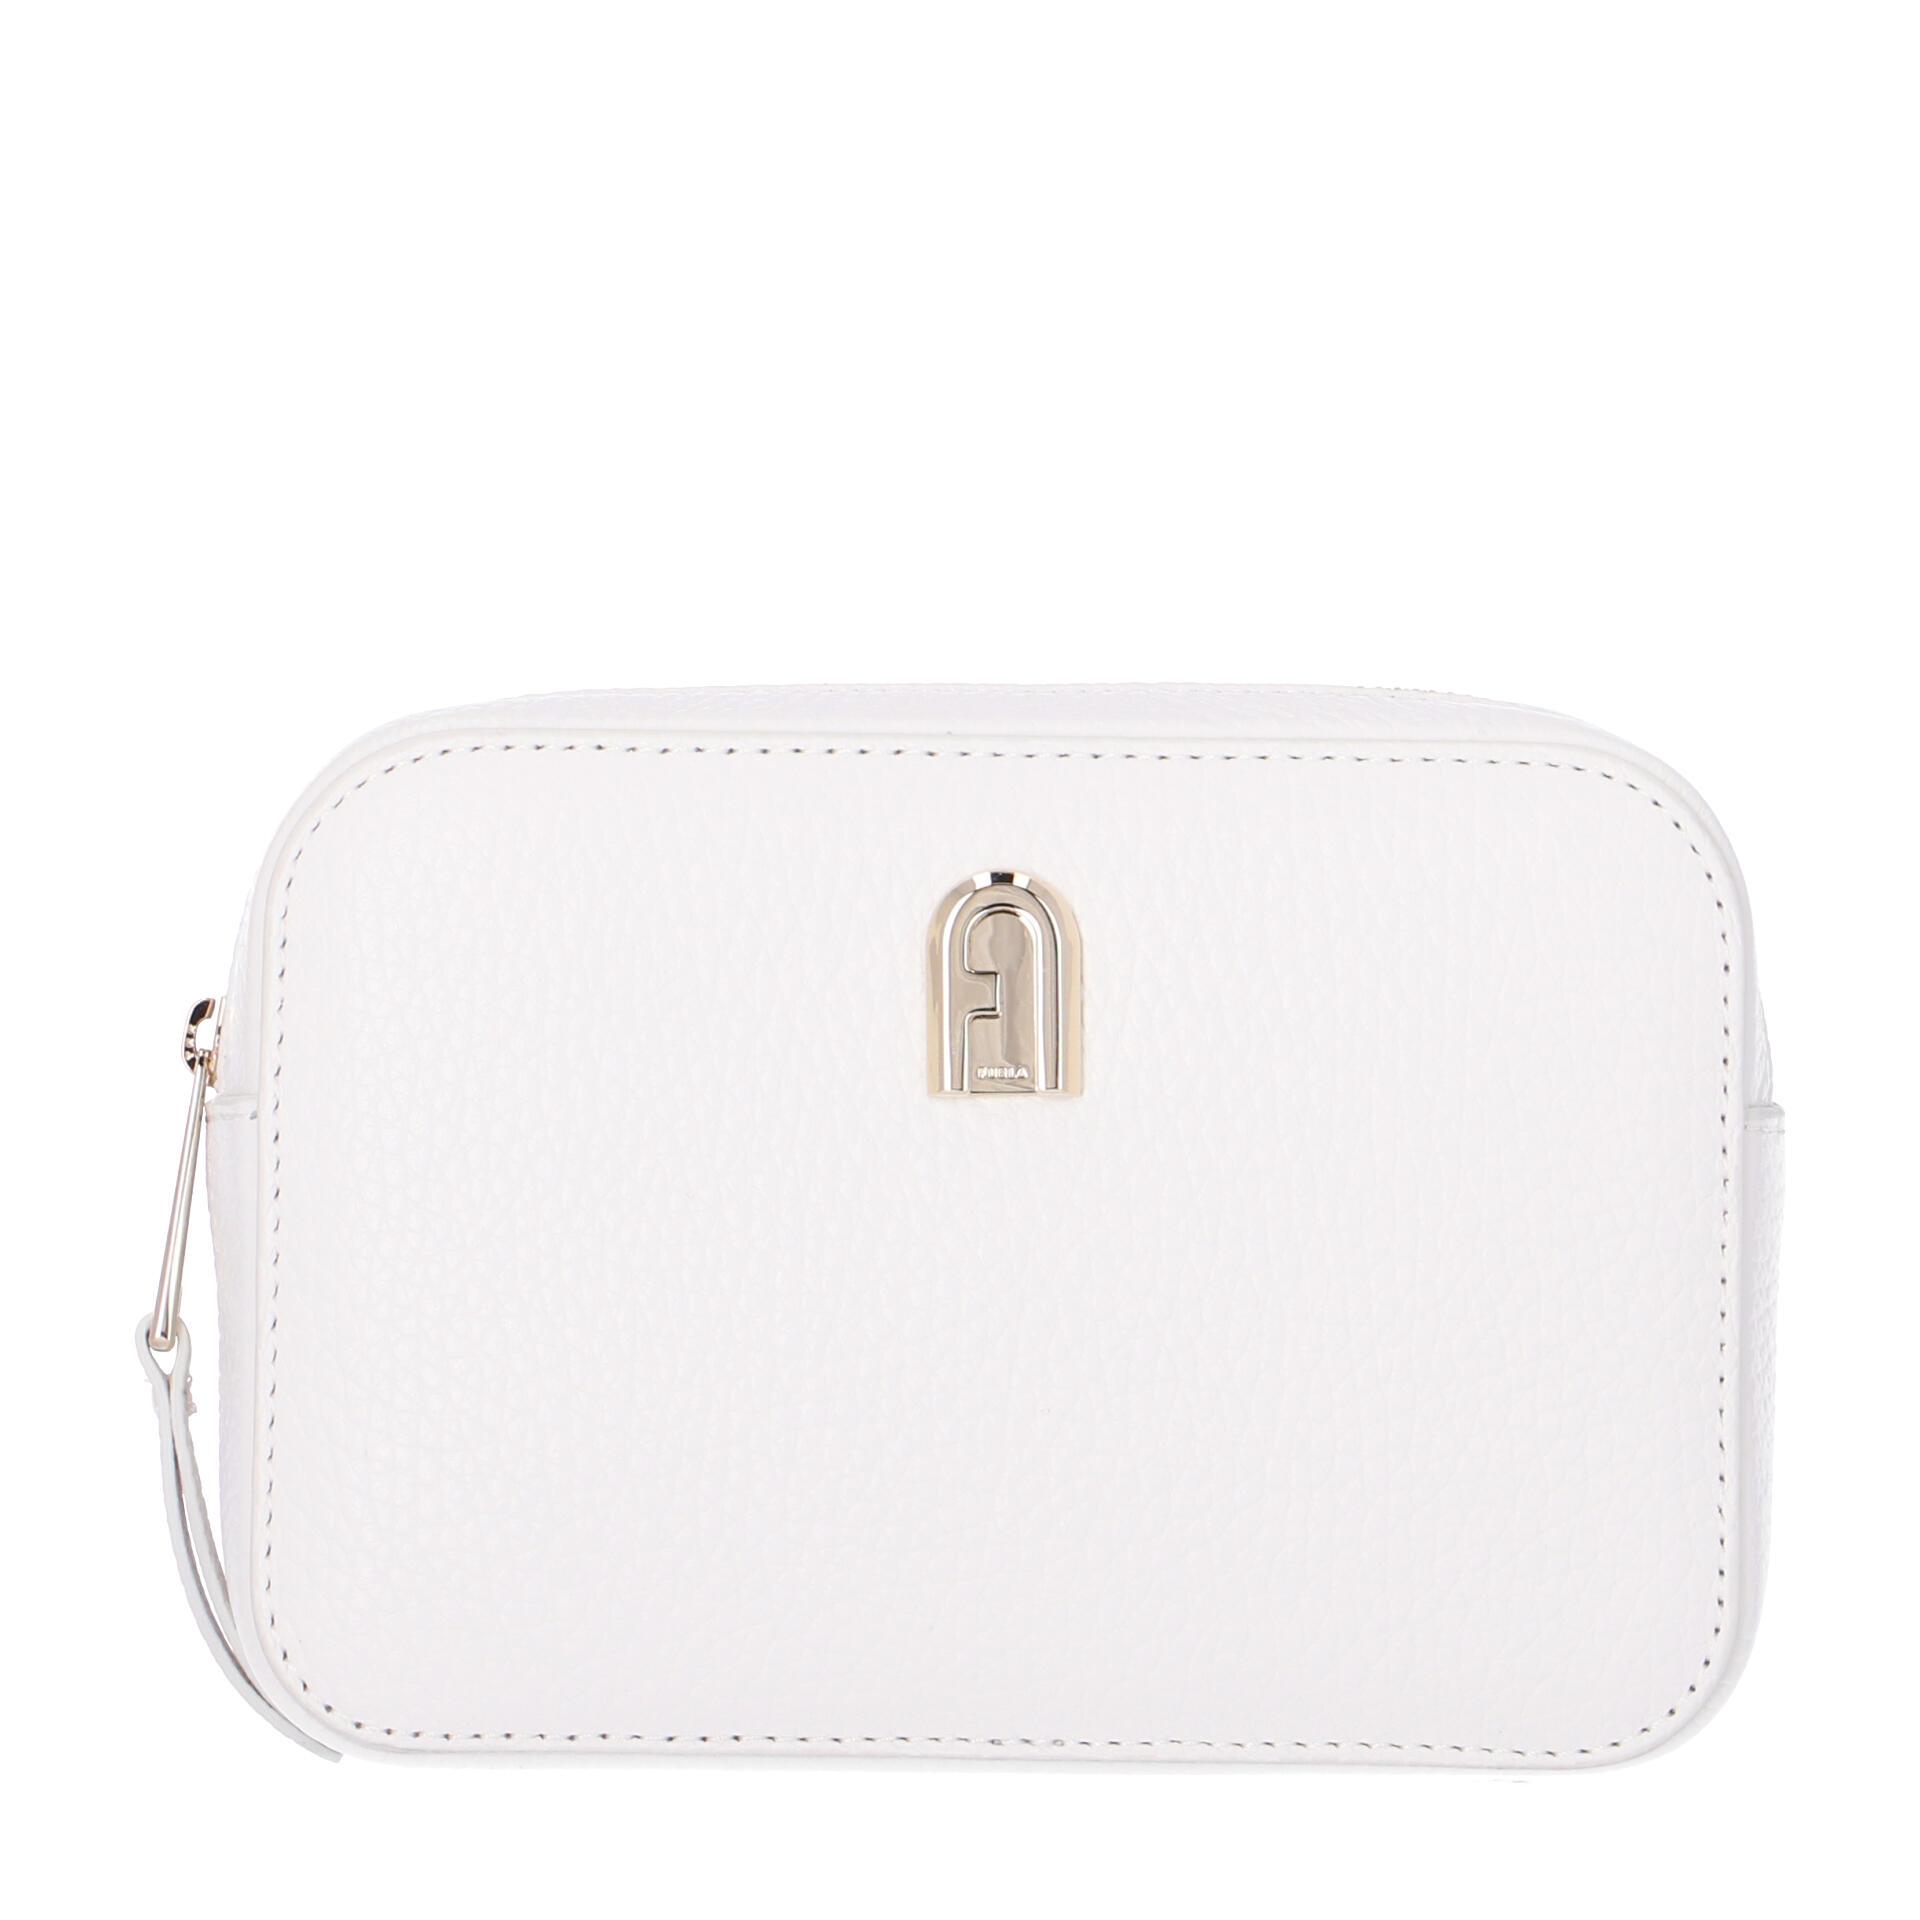 Furla Sleek M Belt Bag